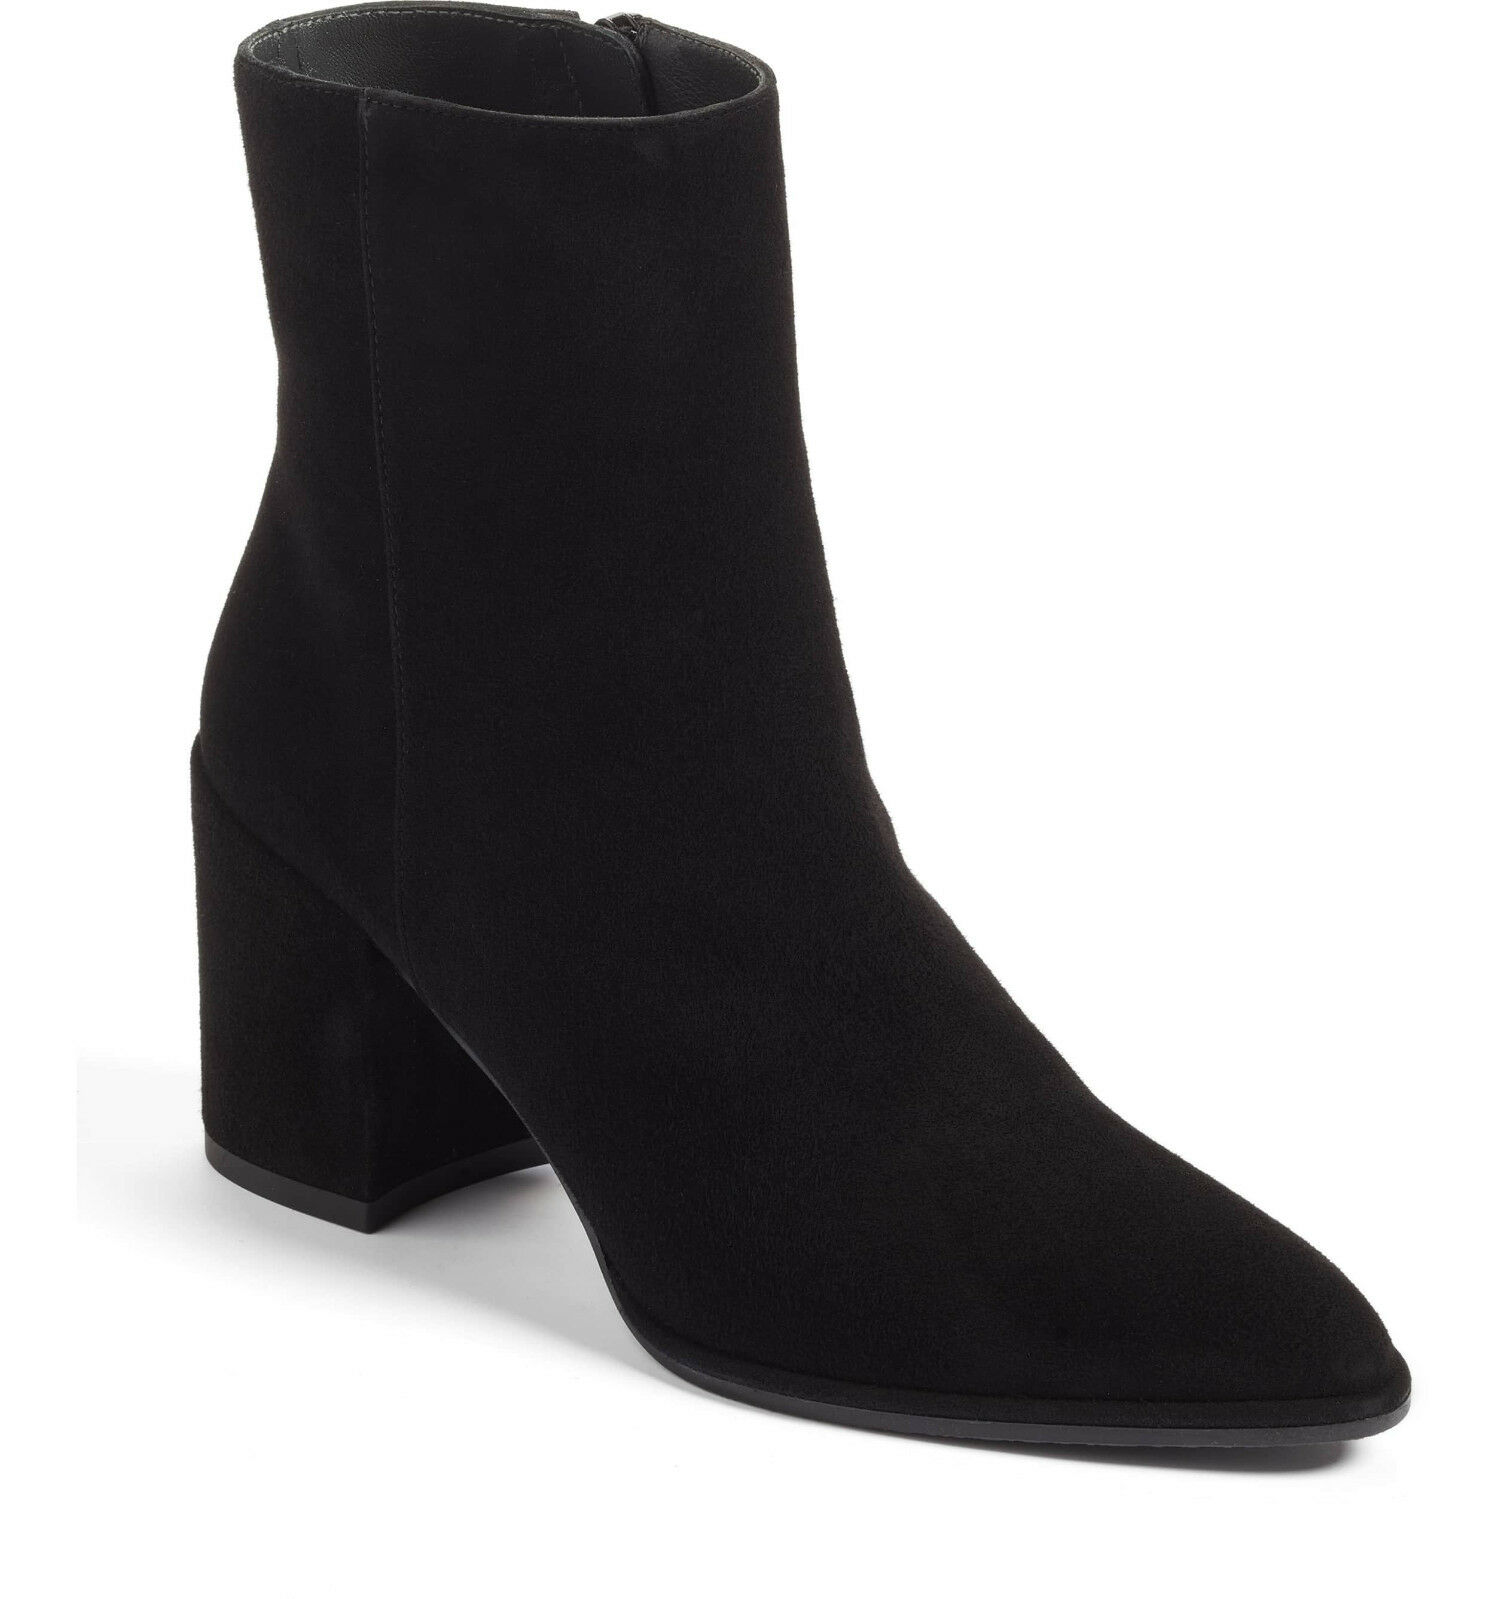 Stuart Weitzman notazzie botaie Mujer Gamuza Botín Negro Talla Talla Talla 10  575 62a5fa